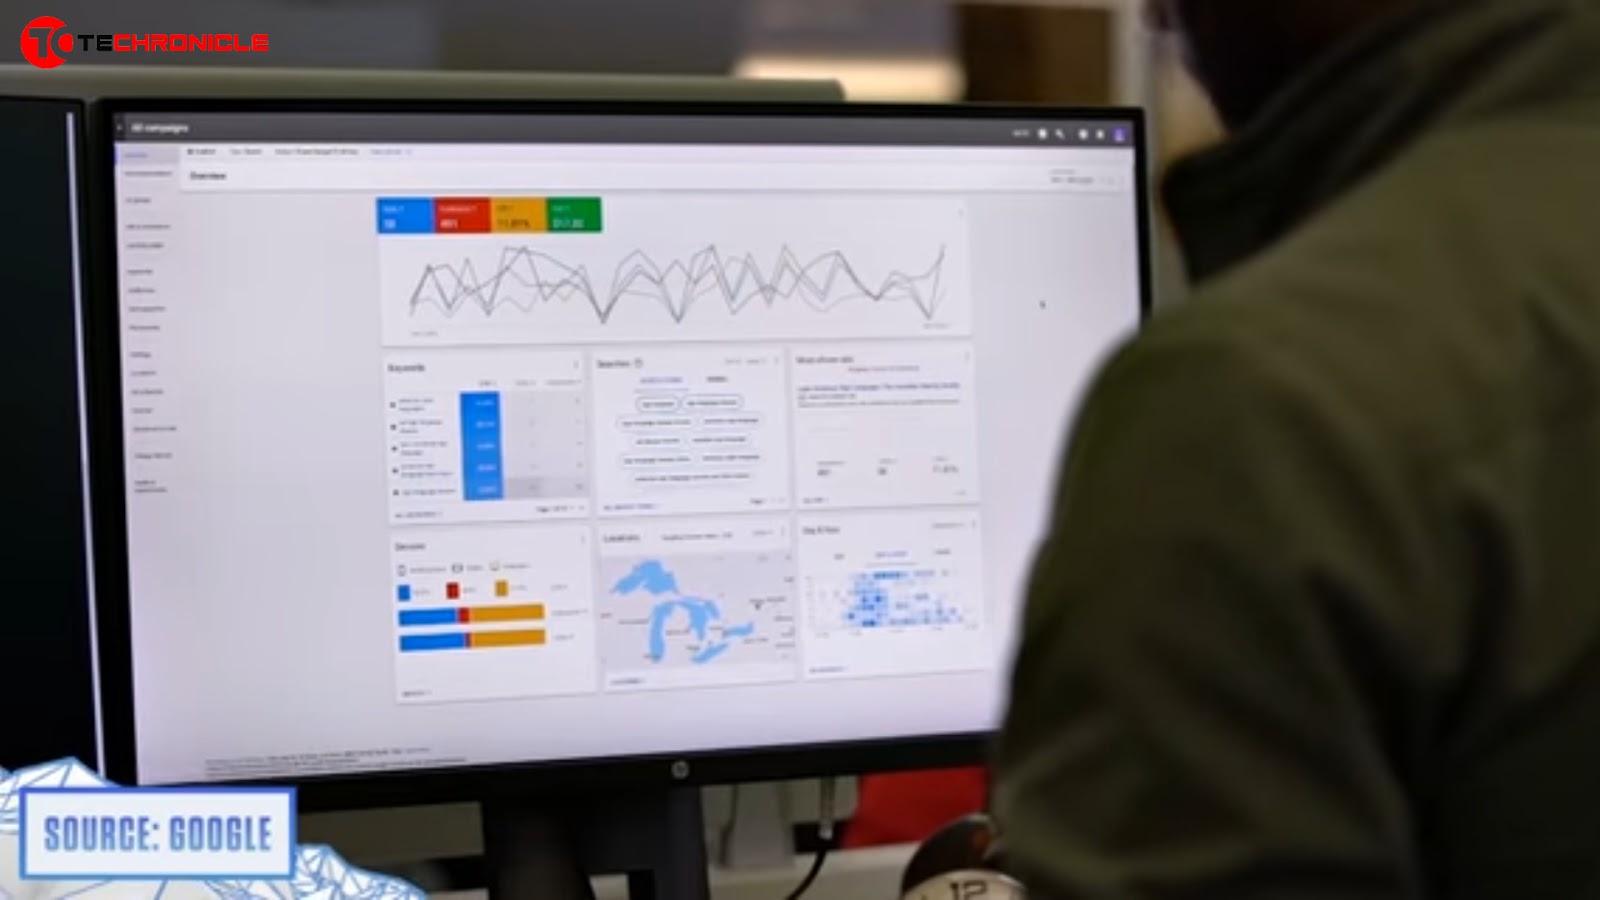 Google Data Theft Techronicle